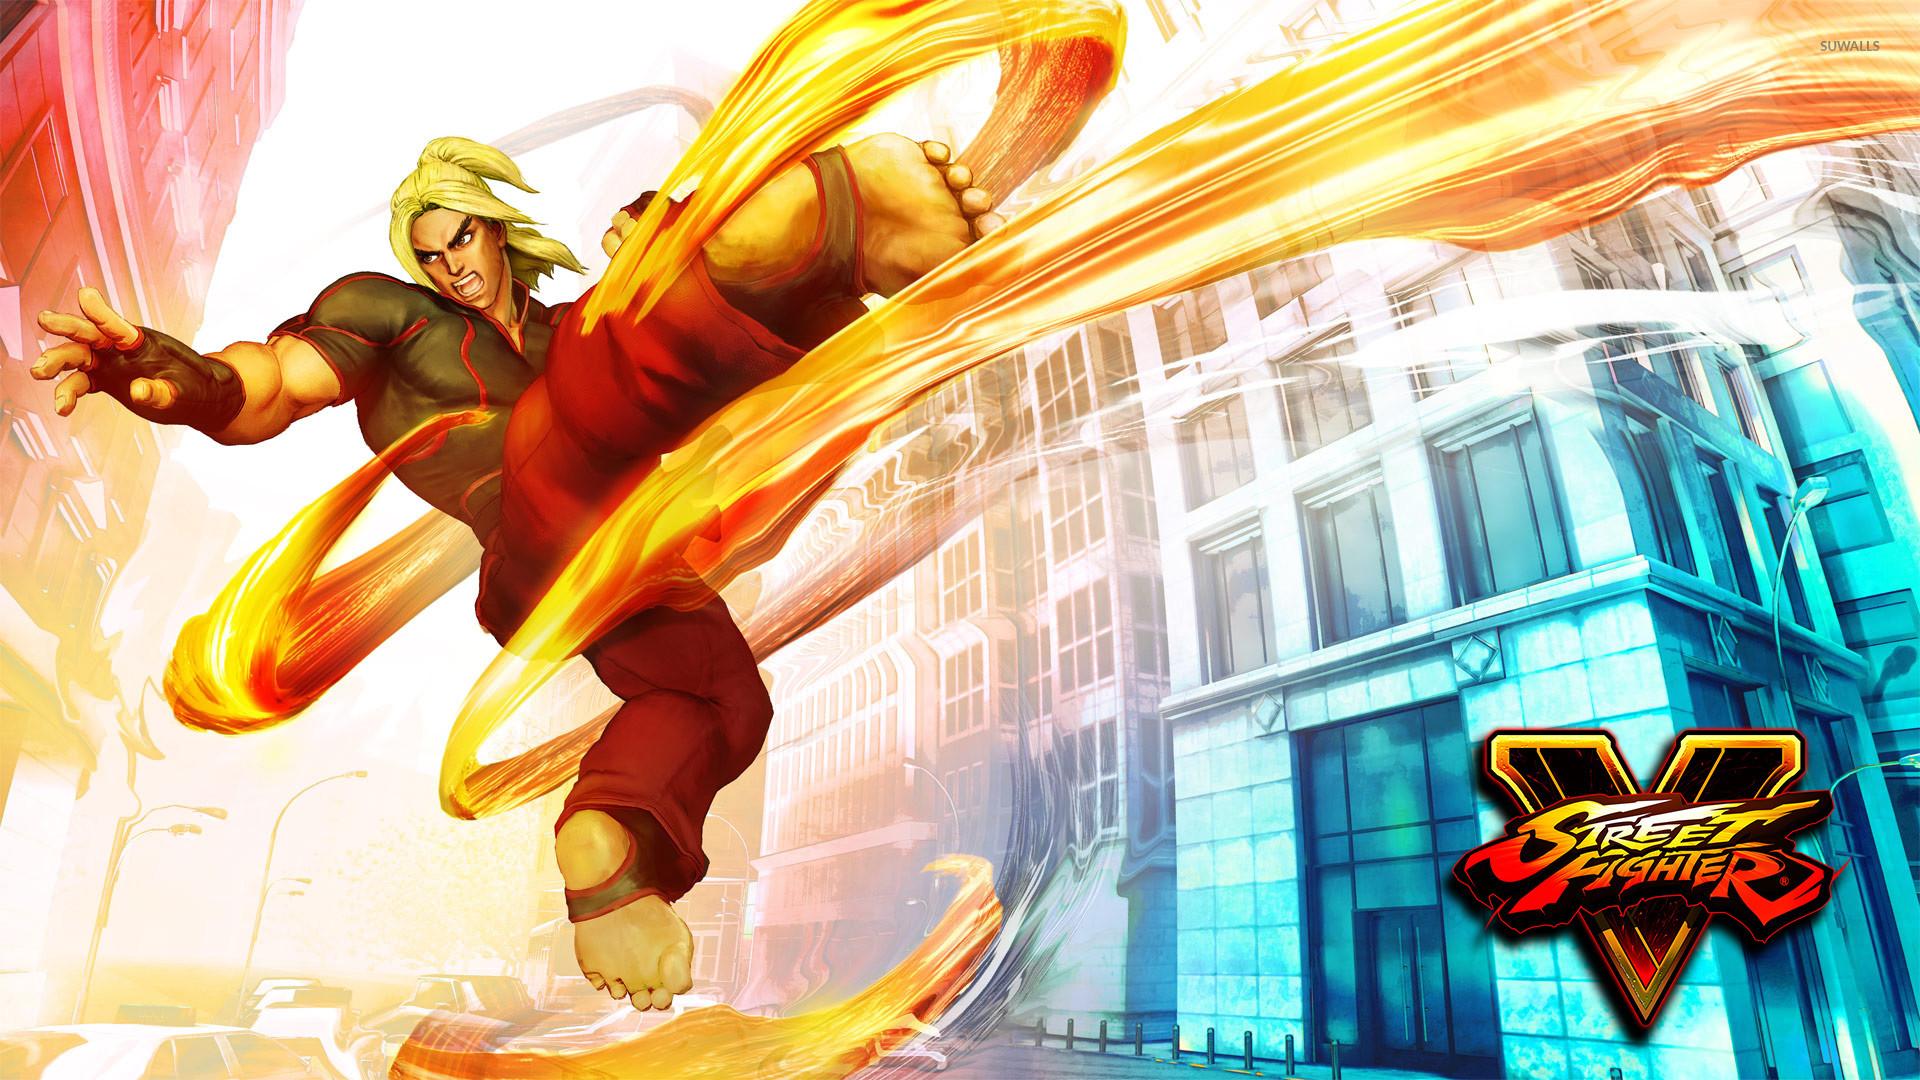 Street Fighter V Wallpapers (73+ images)